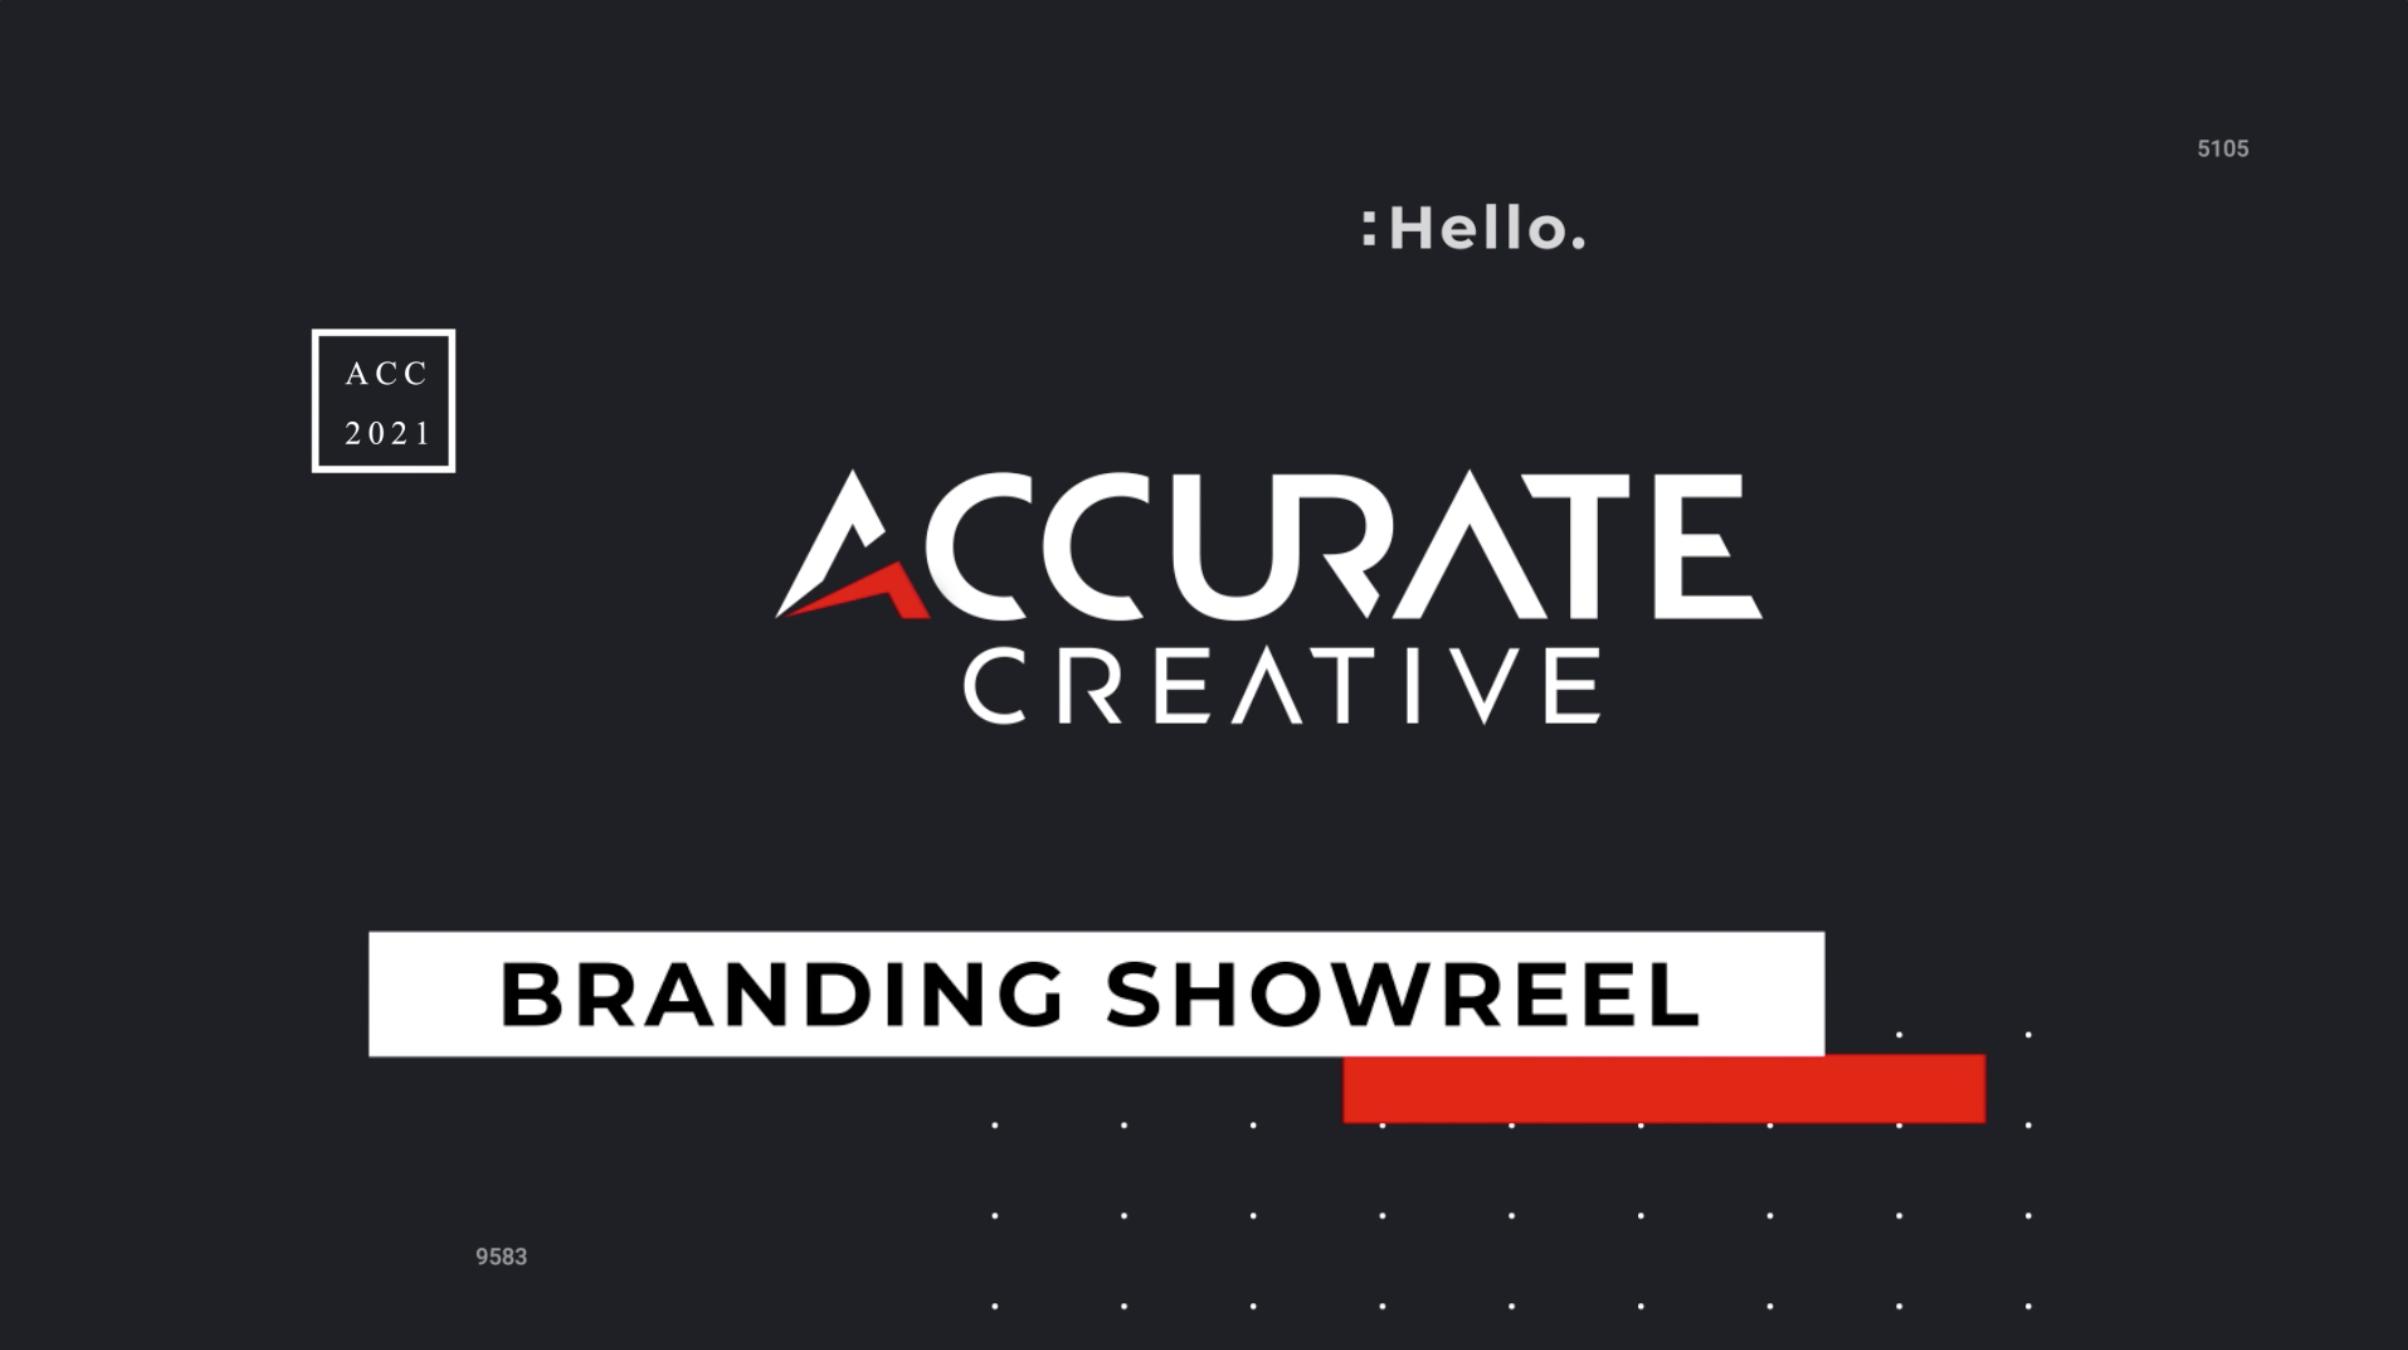 Accurate Branding Showreel 2021